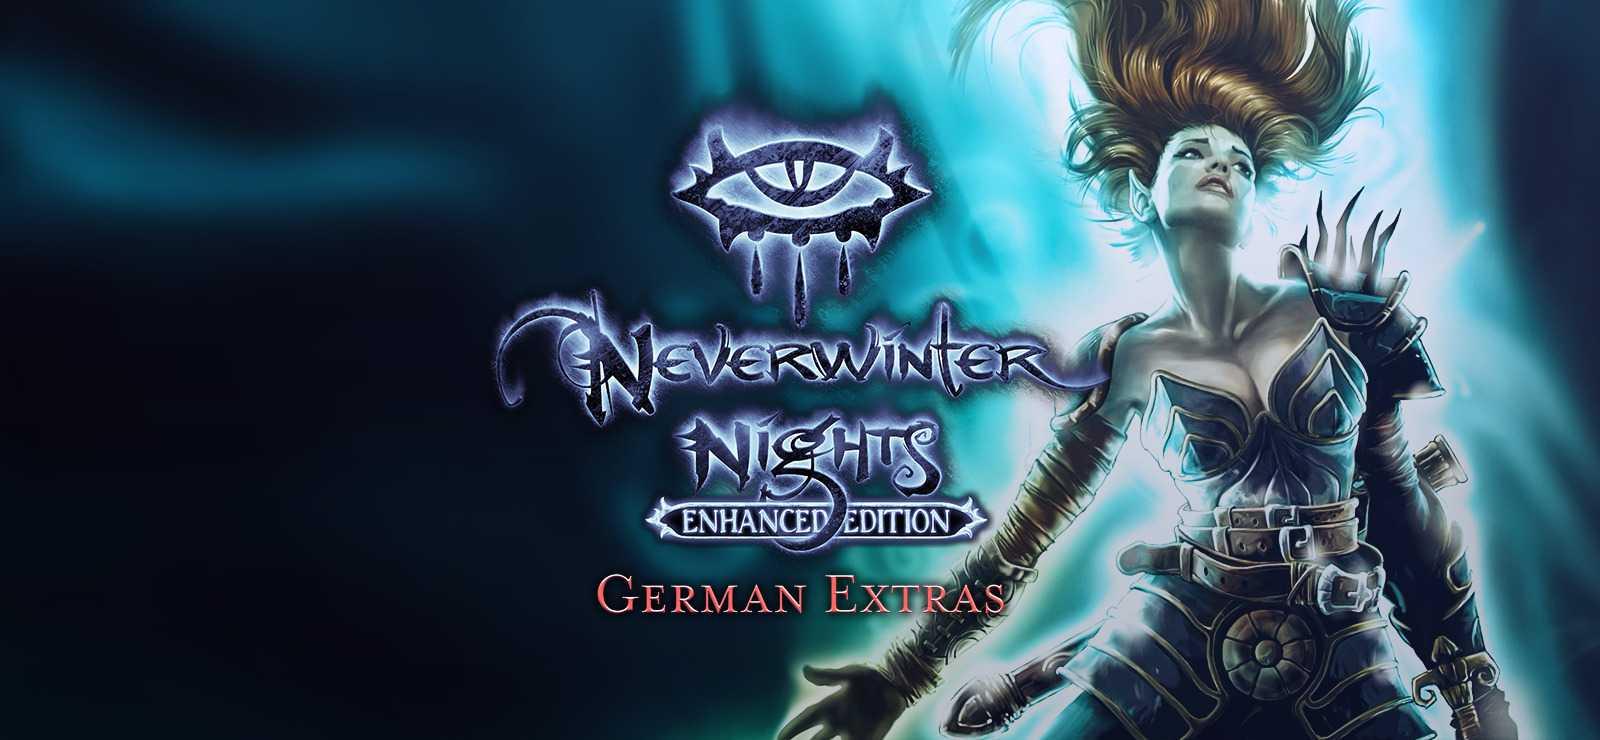 Neverwinter Nights: Enhanced Edition - German Extras